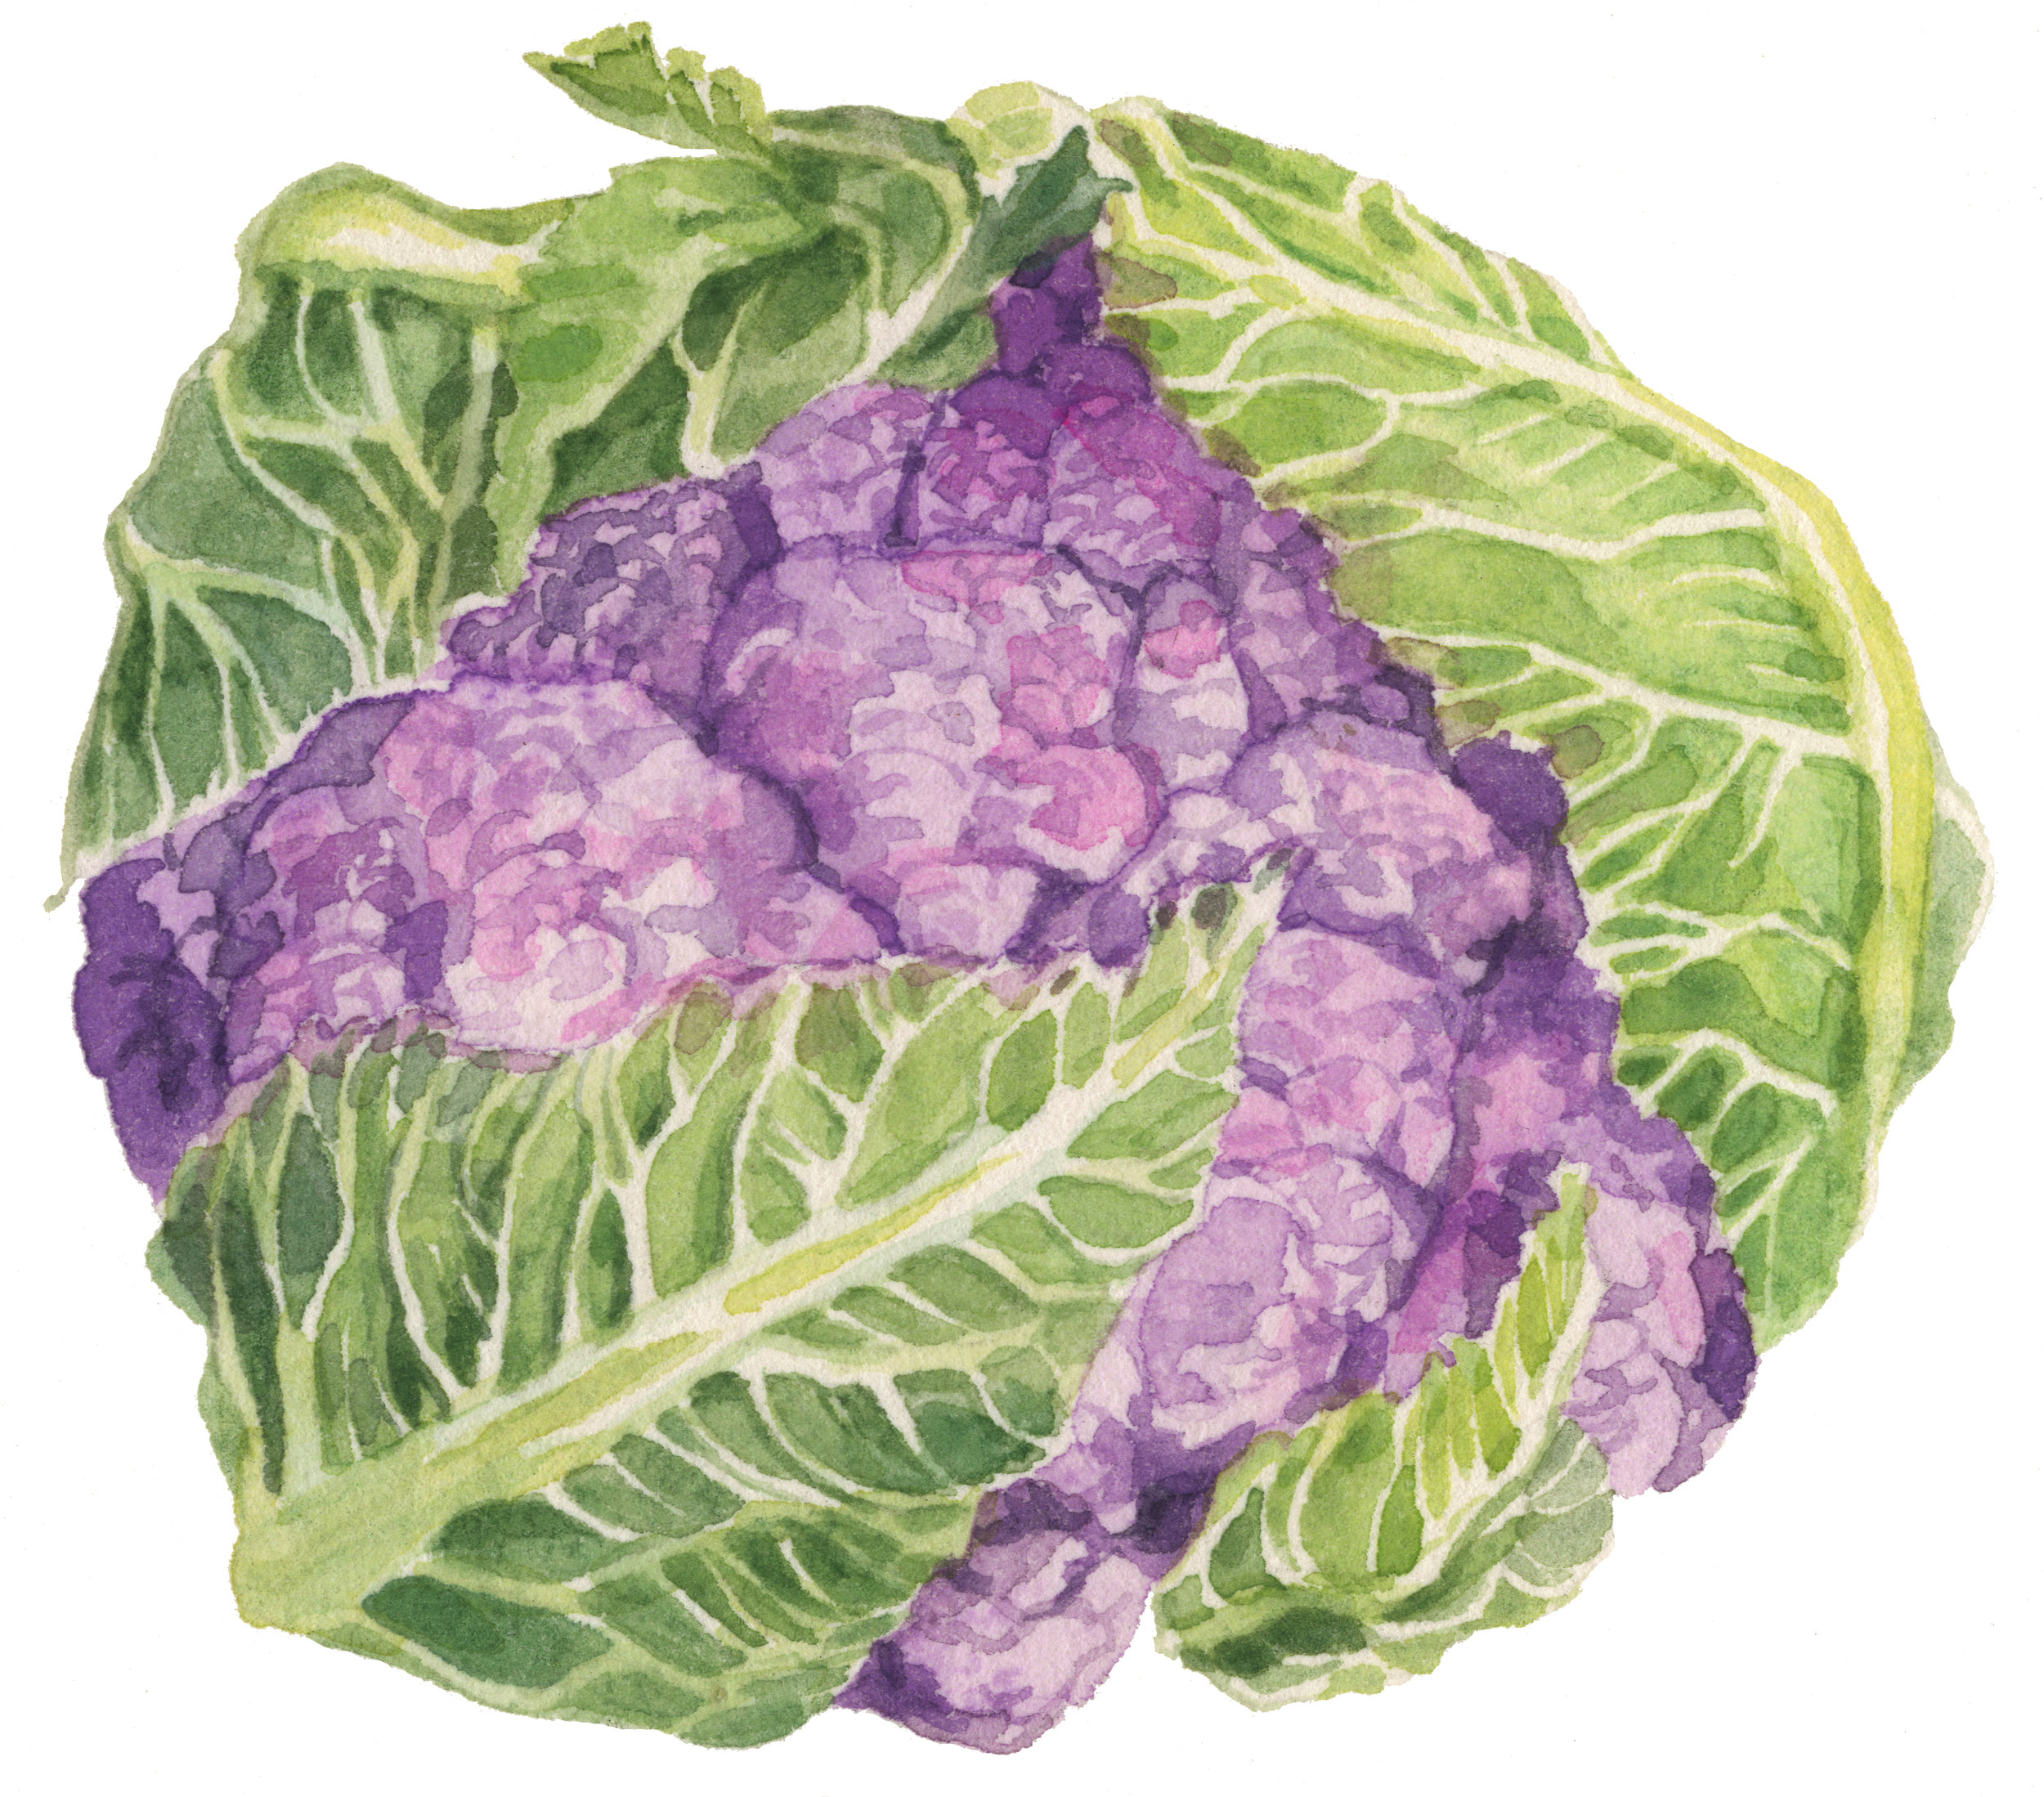 16-cauliflower-lrg.jpg